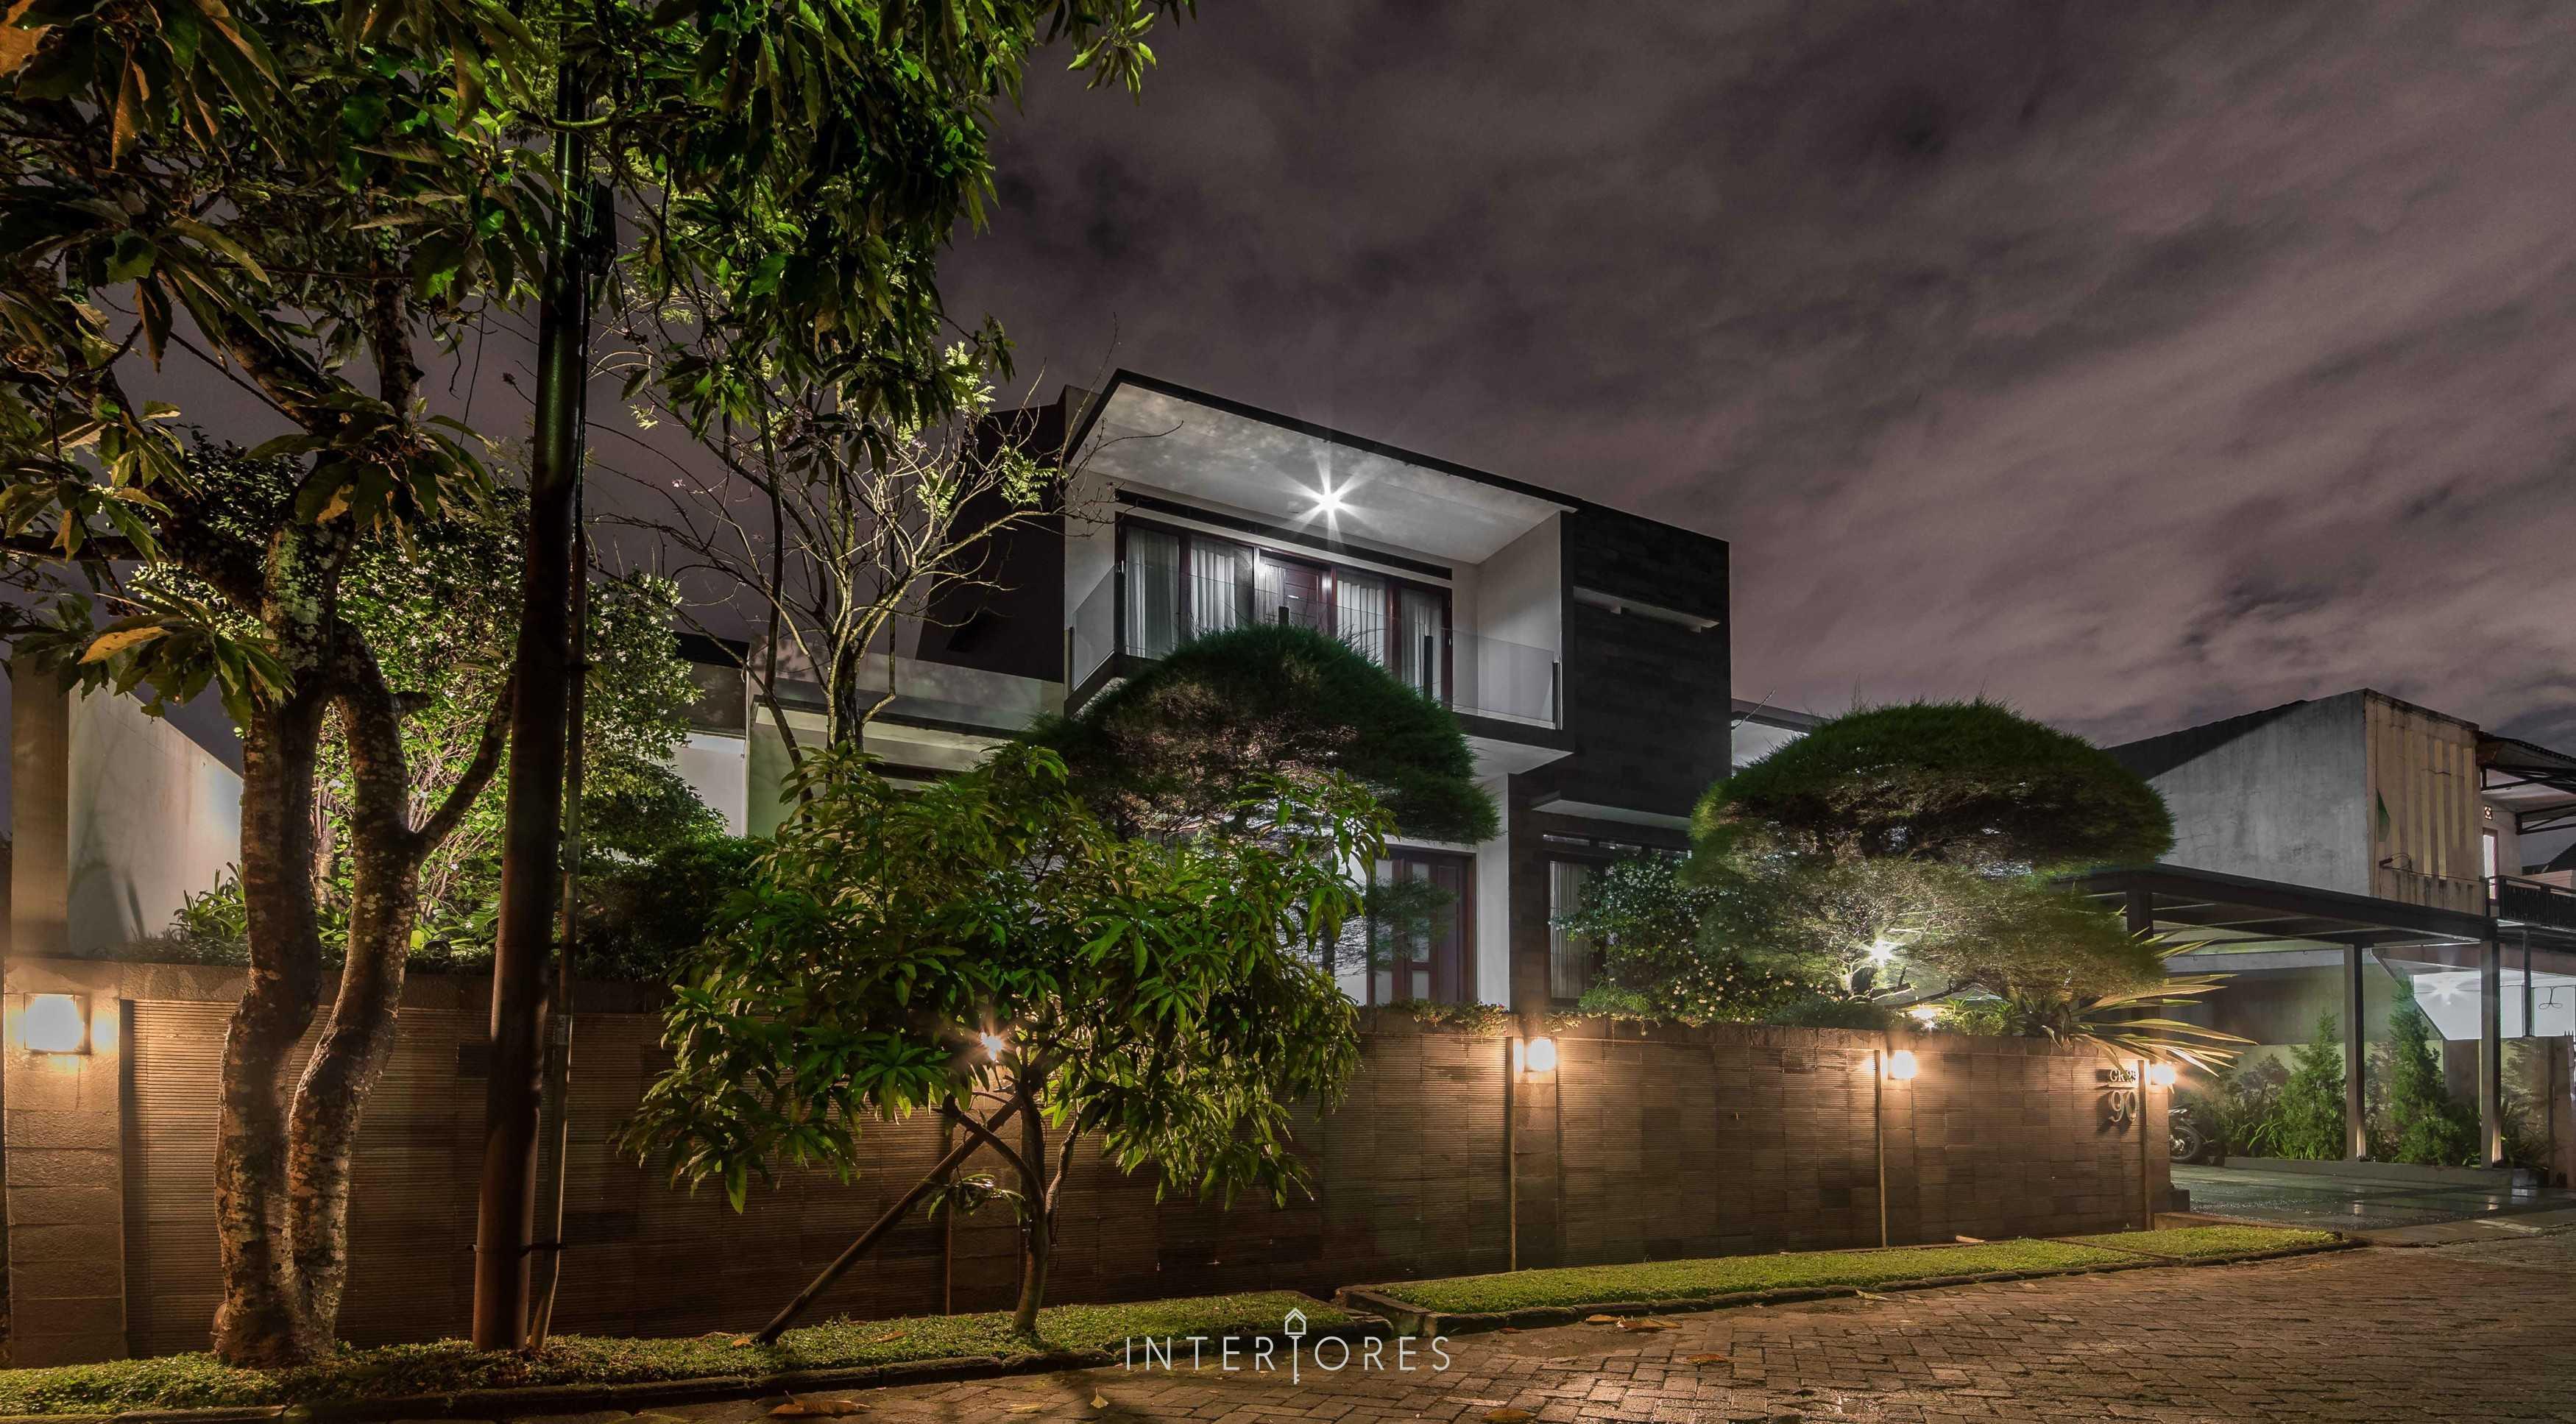 Interiores Interior Consultant & Build Greta 90 Bintaro Bintaro Front View Kontemporer  17671